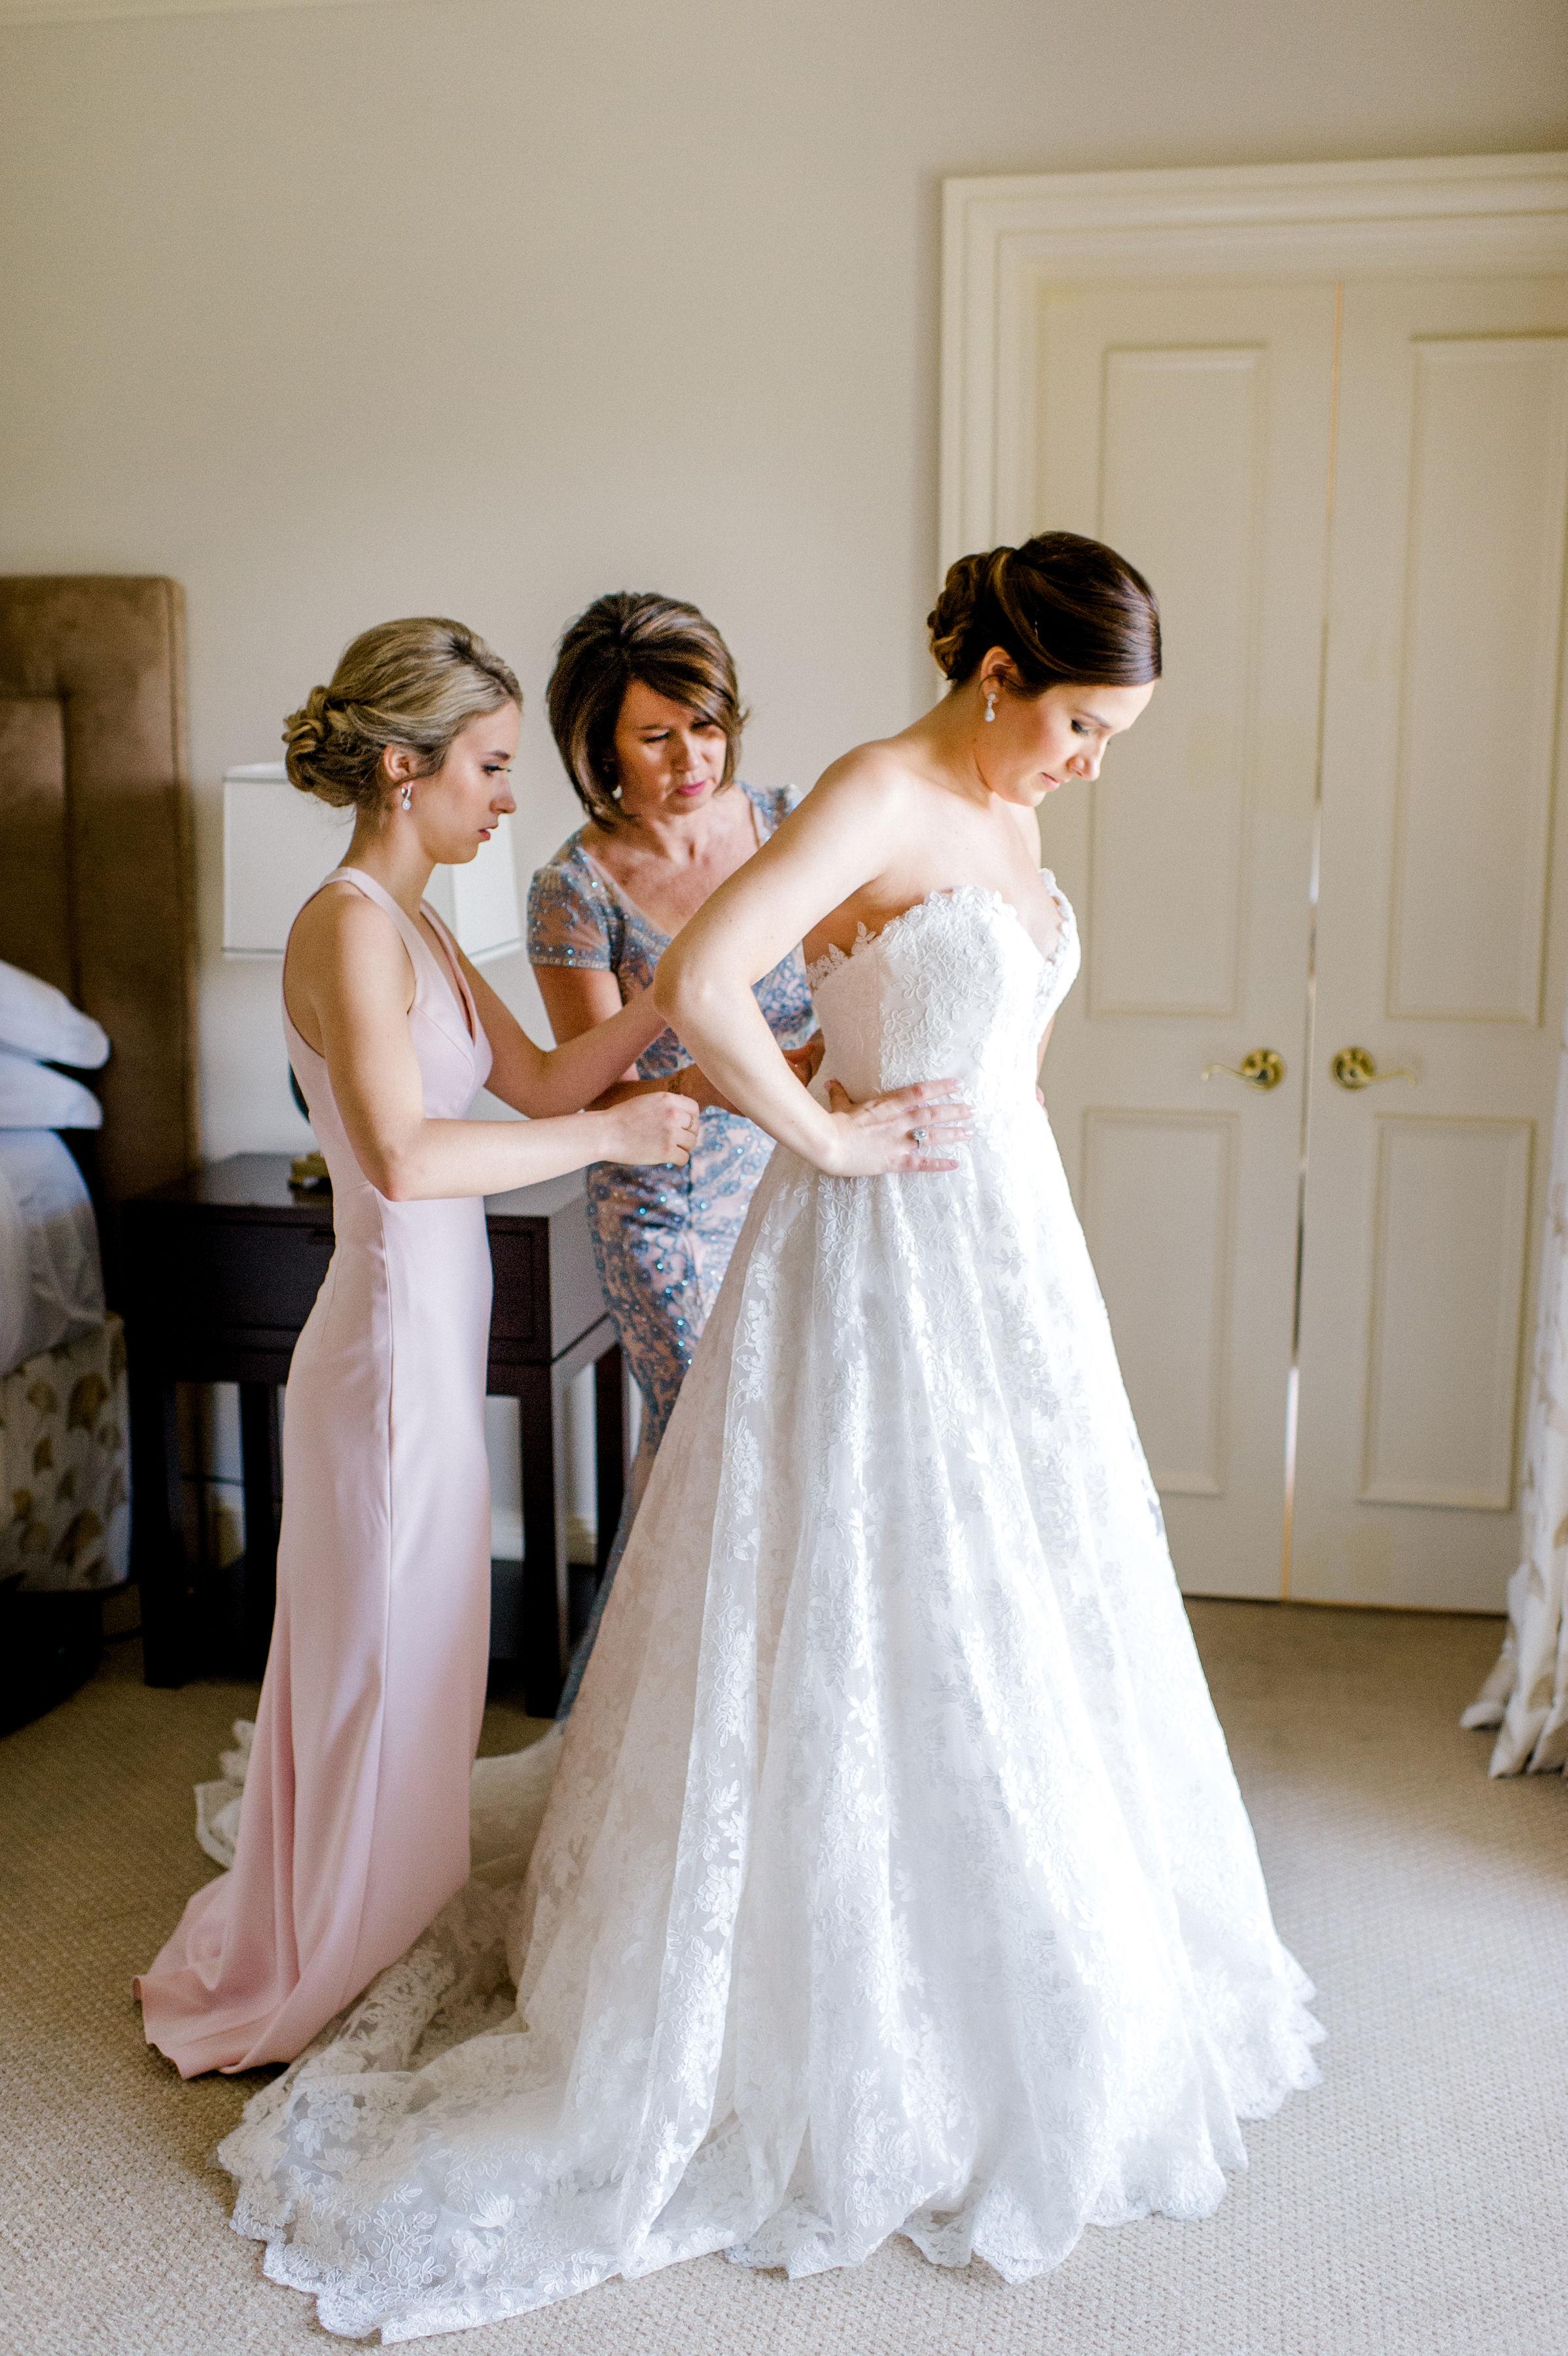 McElravey_Wedding_CarolineLimaPhotography_2018_075.jpg